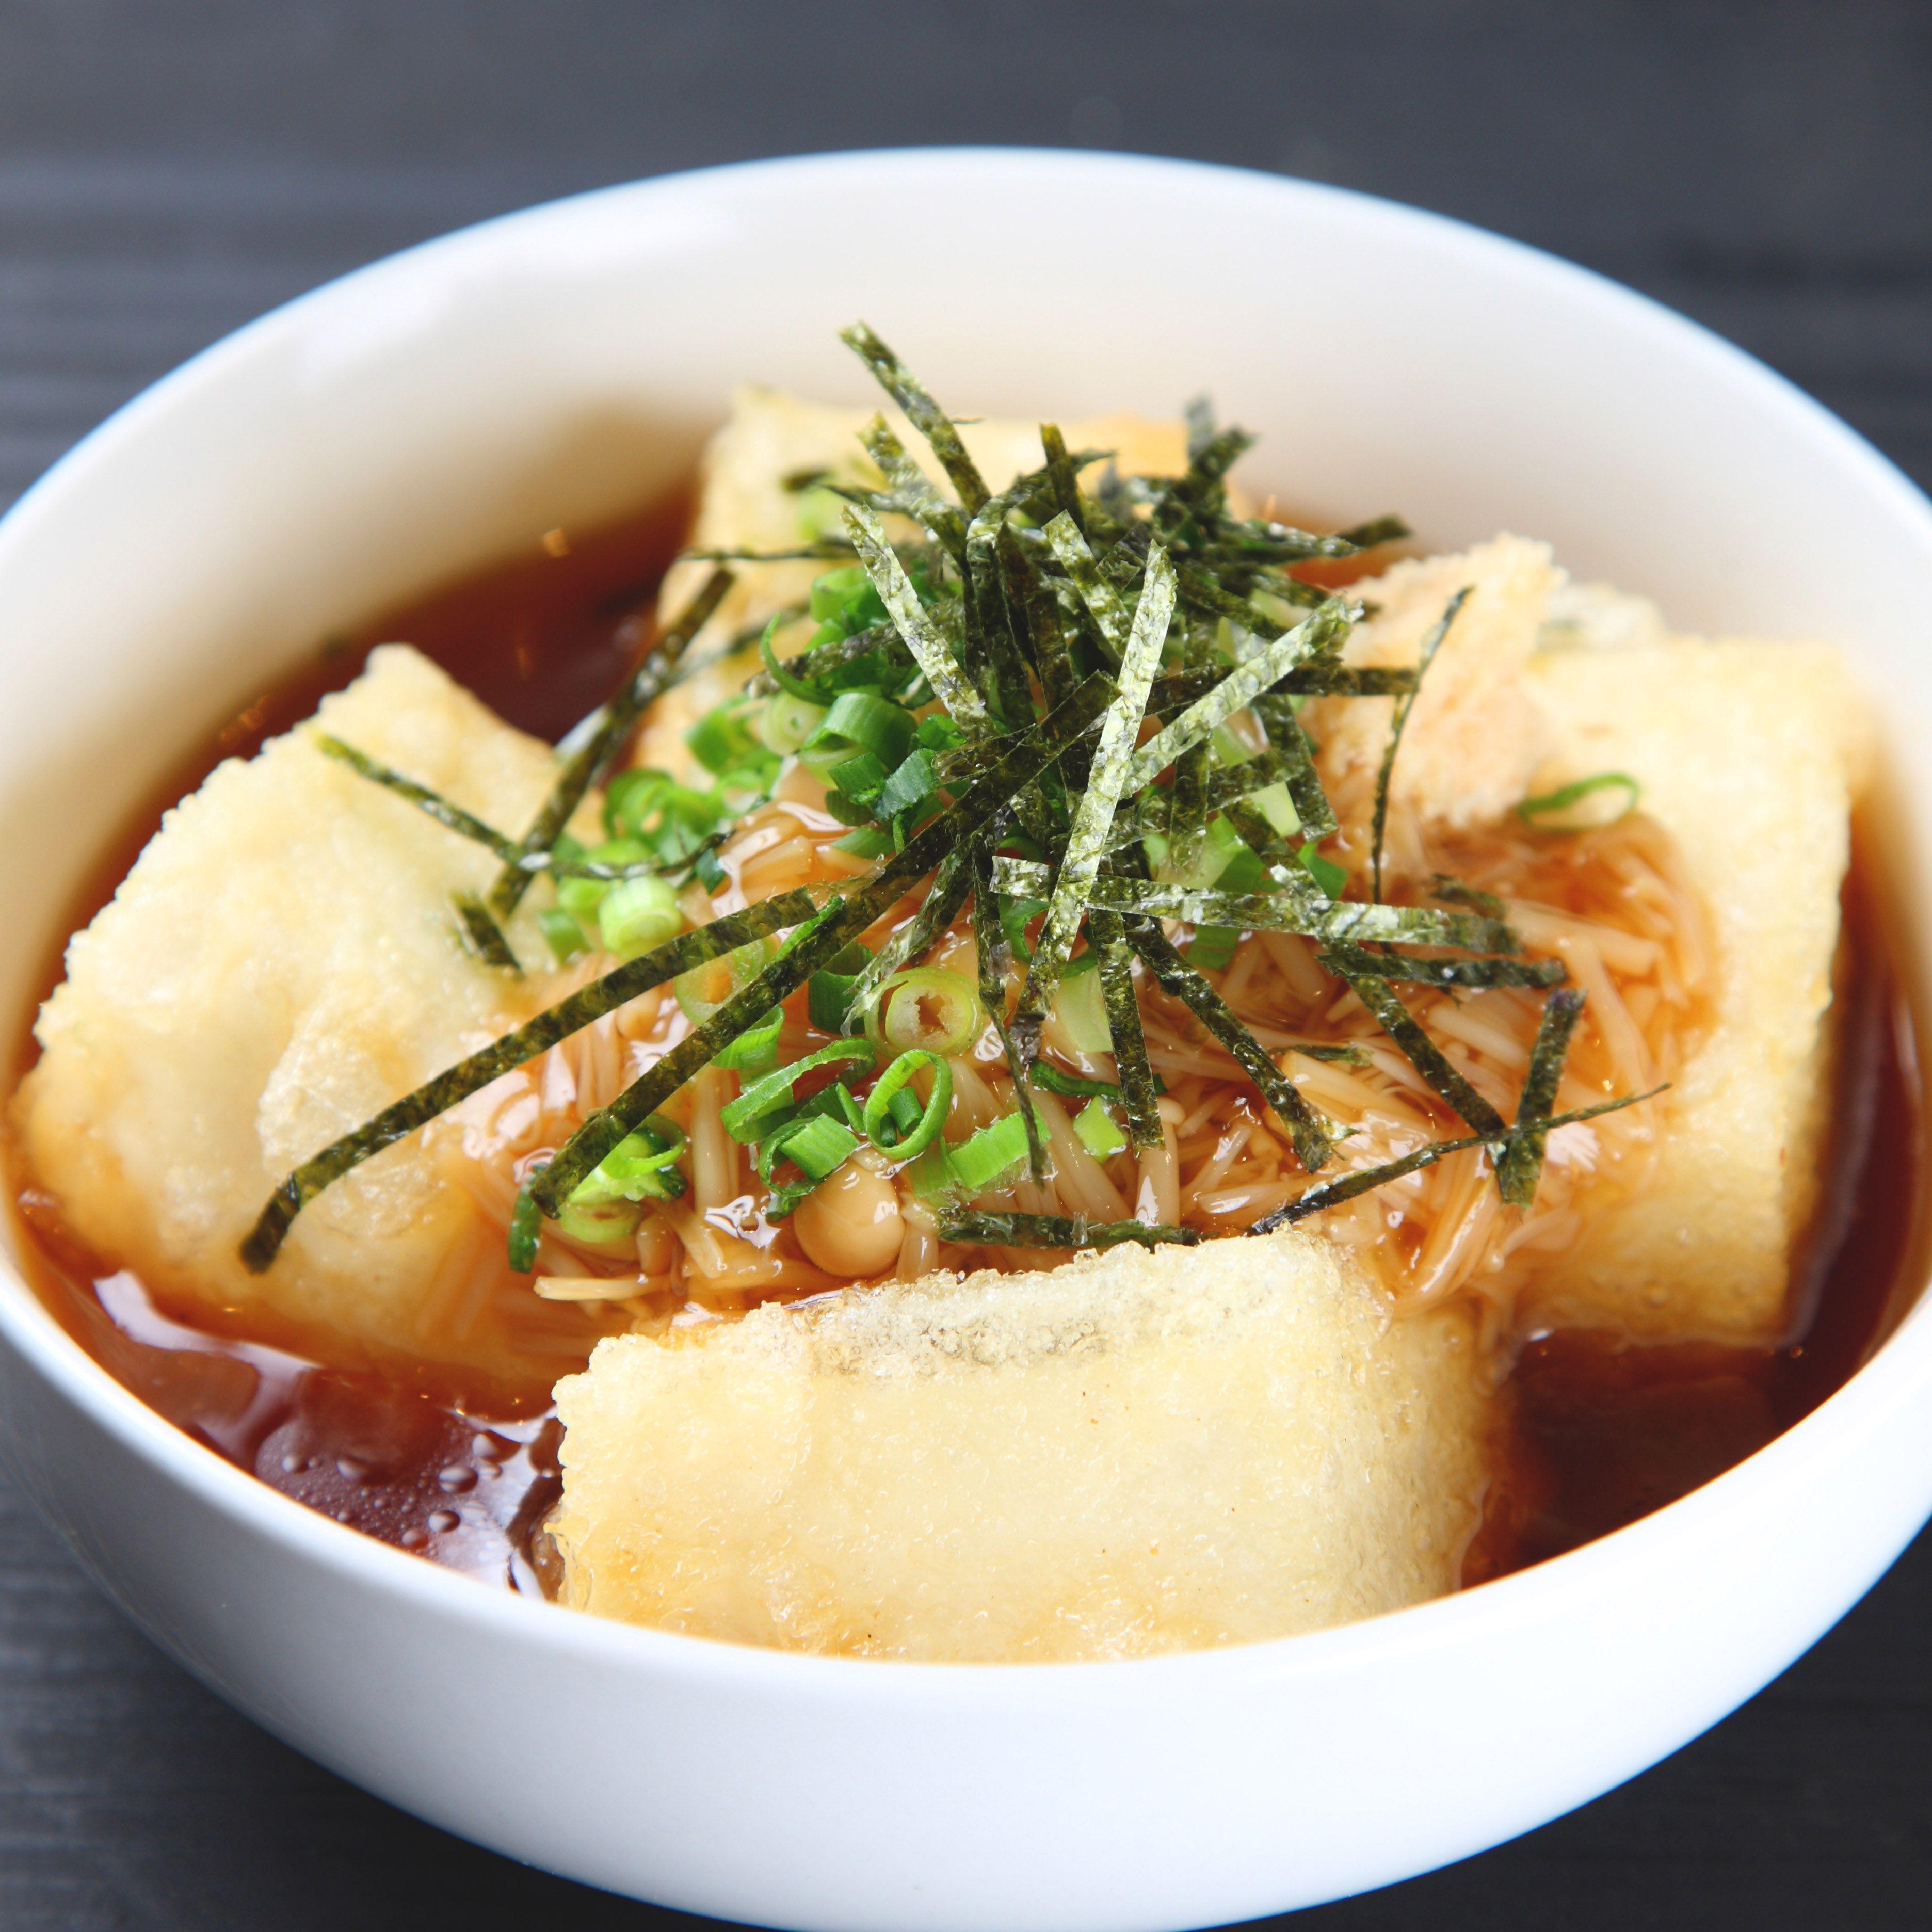 Resep Agedashi Tofu Resep Resep Tahu Makanan Resep Makanan